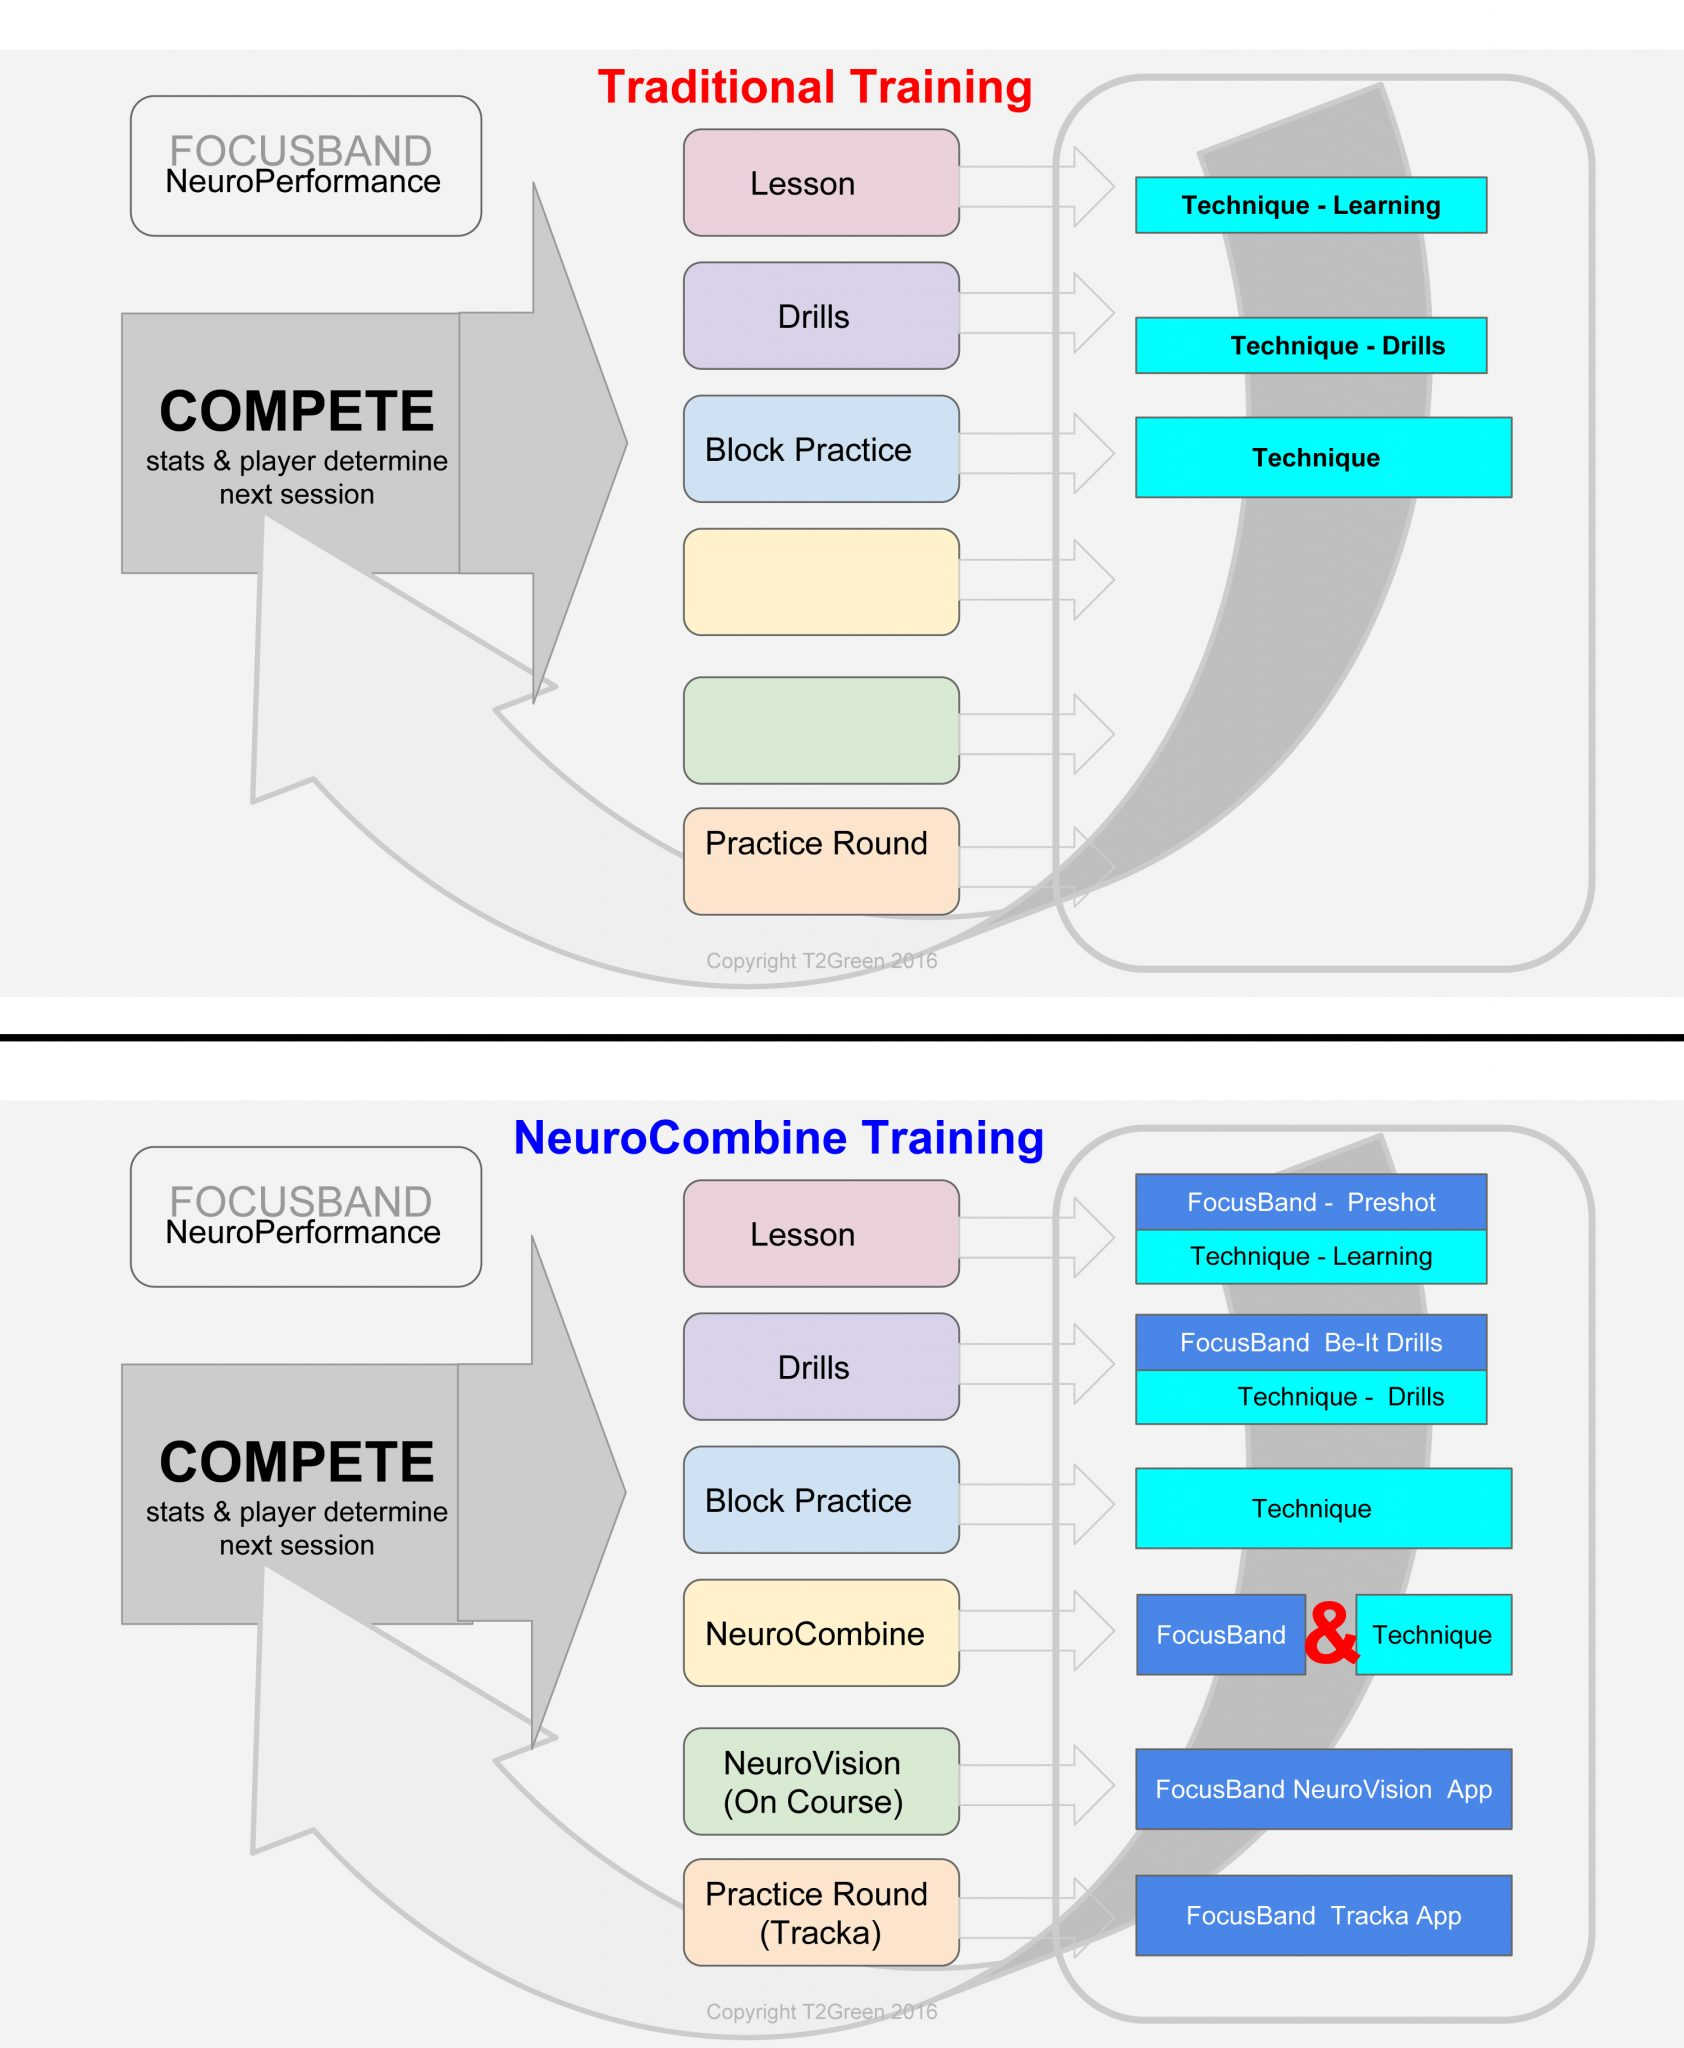 FocusBand,FocusBand Paradigm Shift In Training,FocusBand Brain Sensing Headband